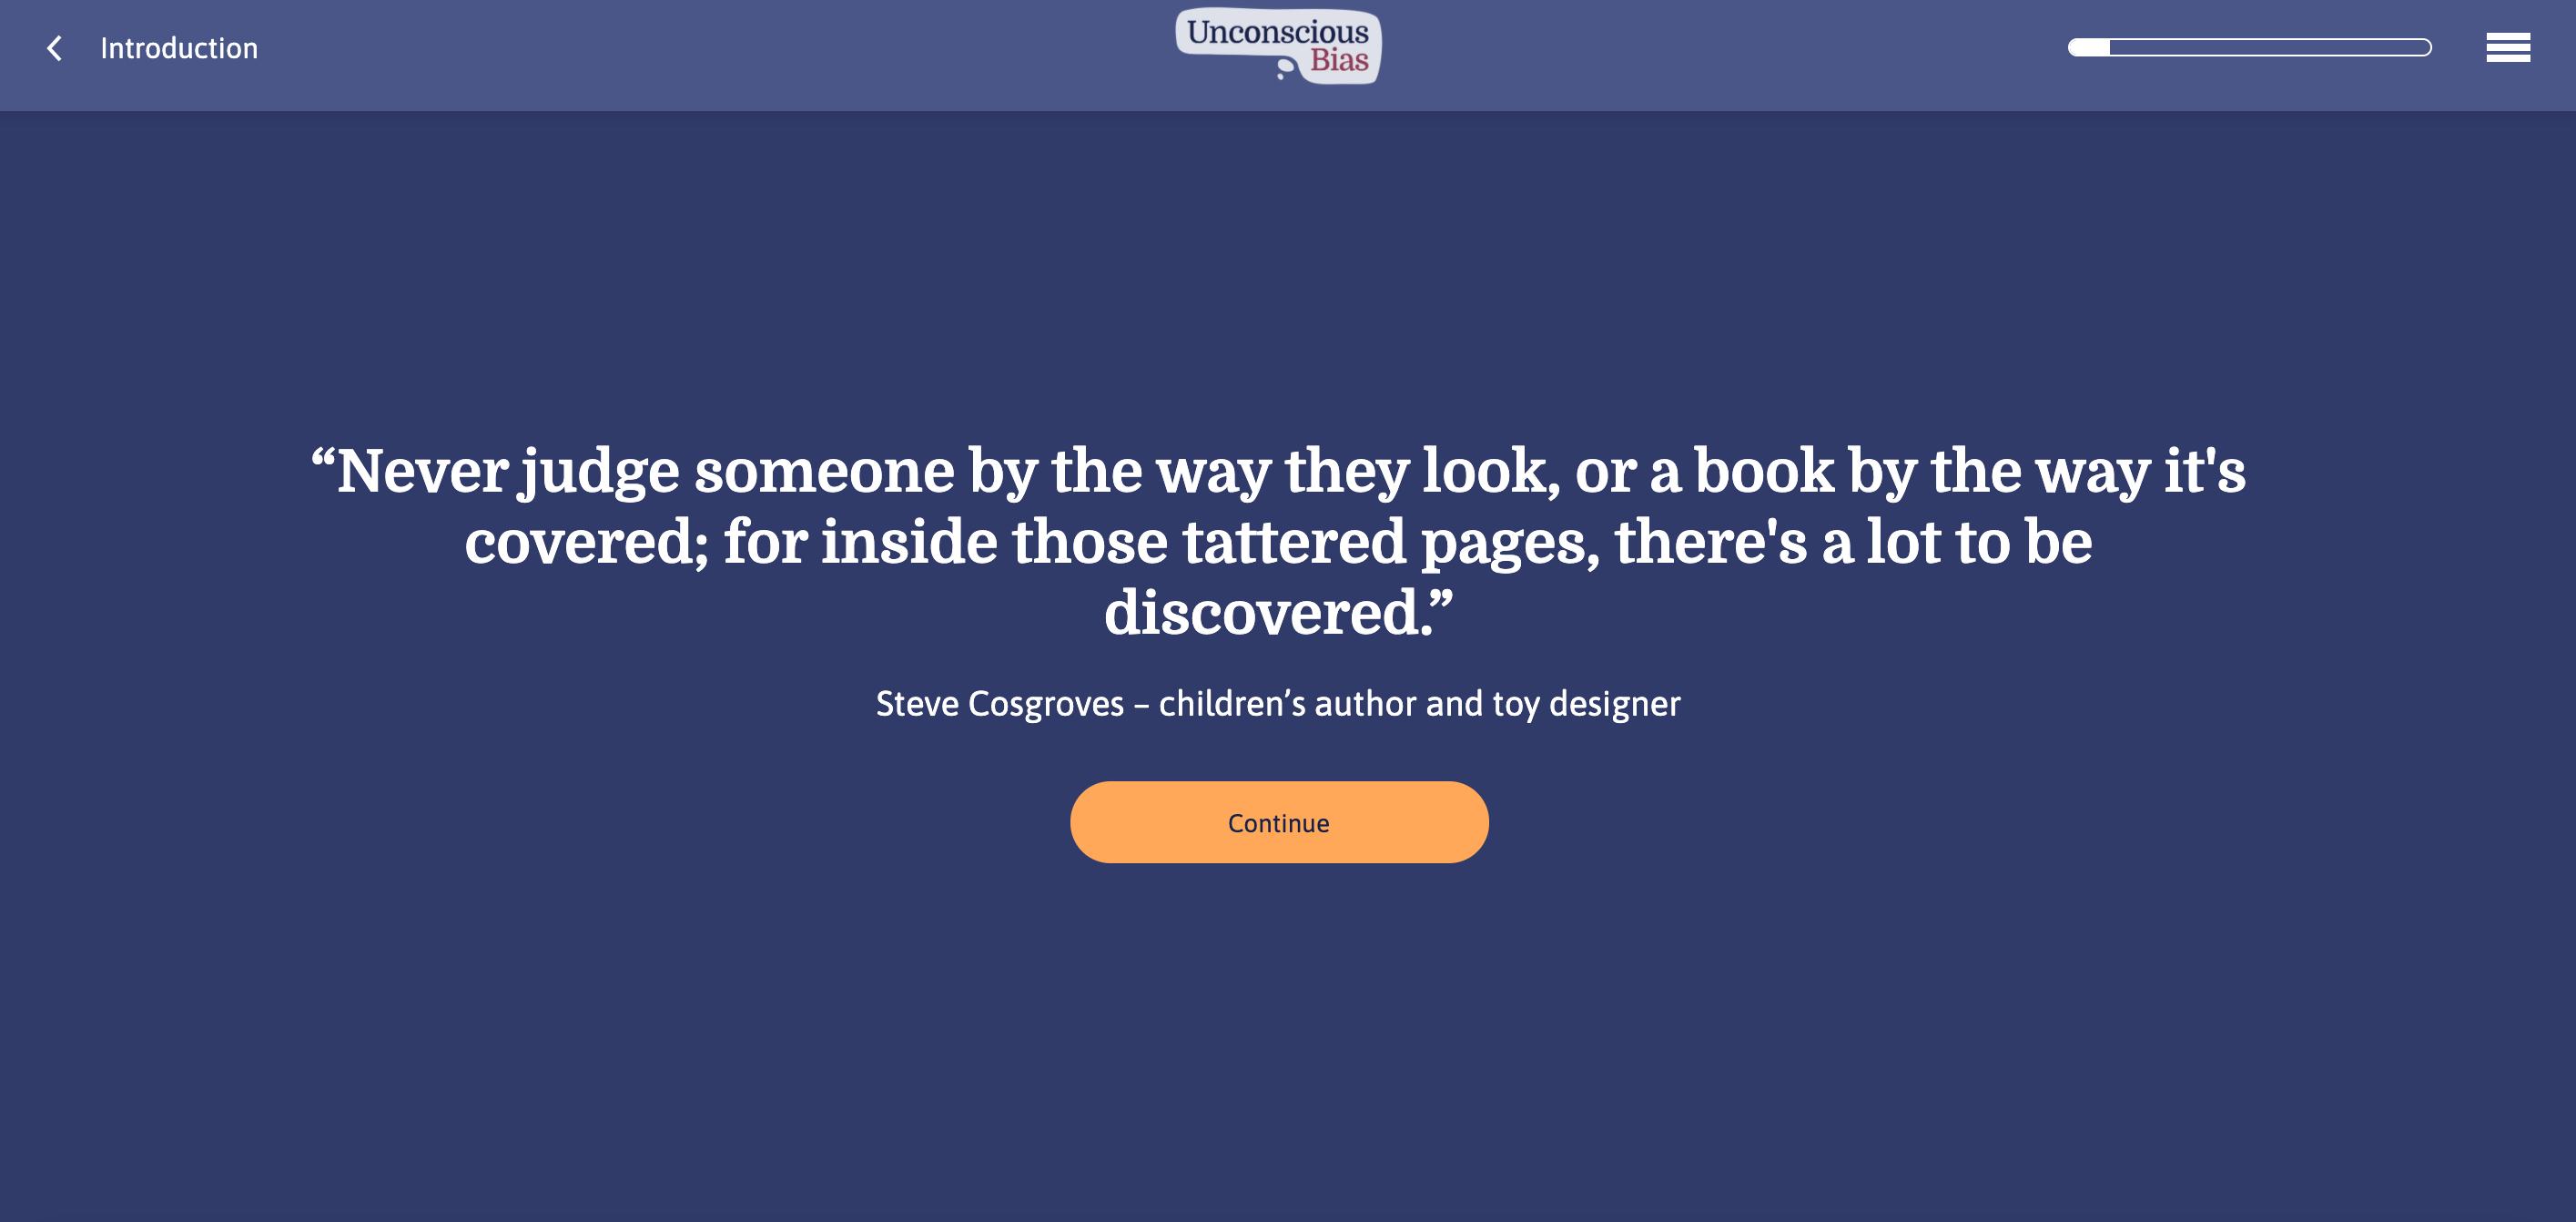 Unconscious Bias Quote Screenshot